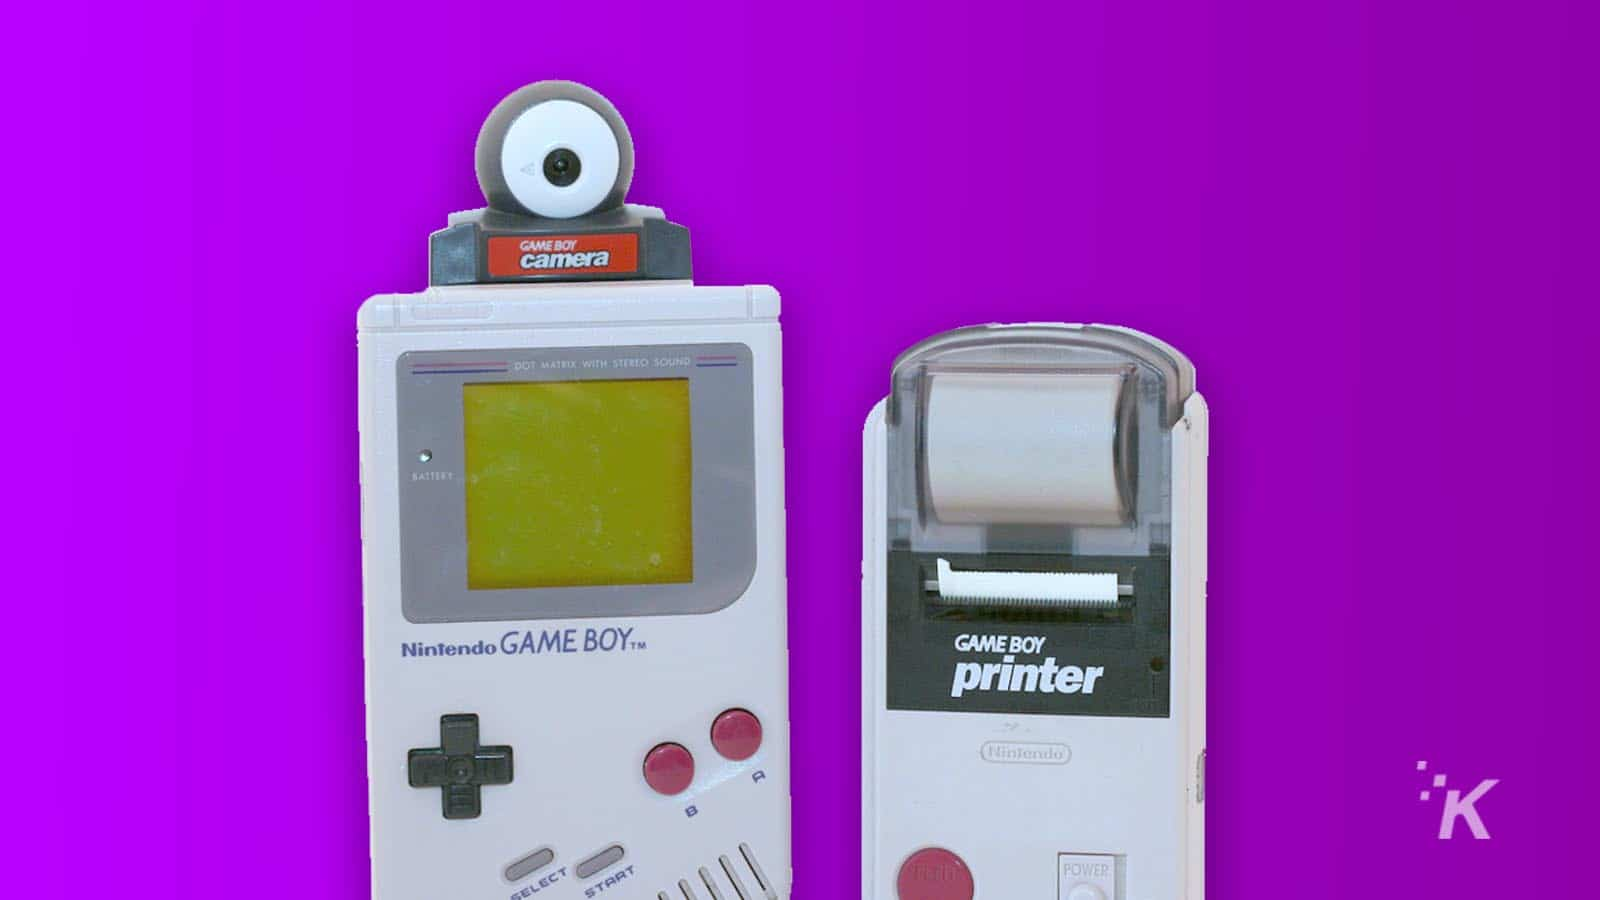 game boy printer and camera